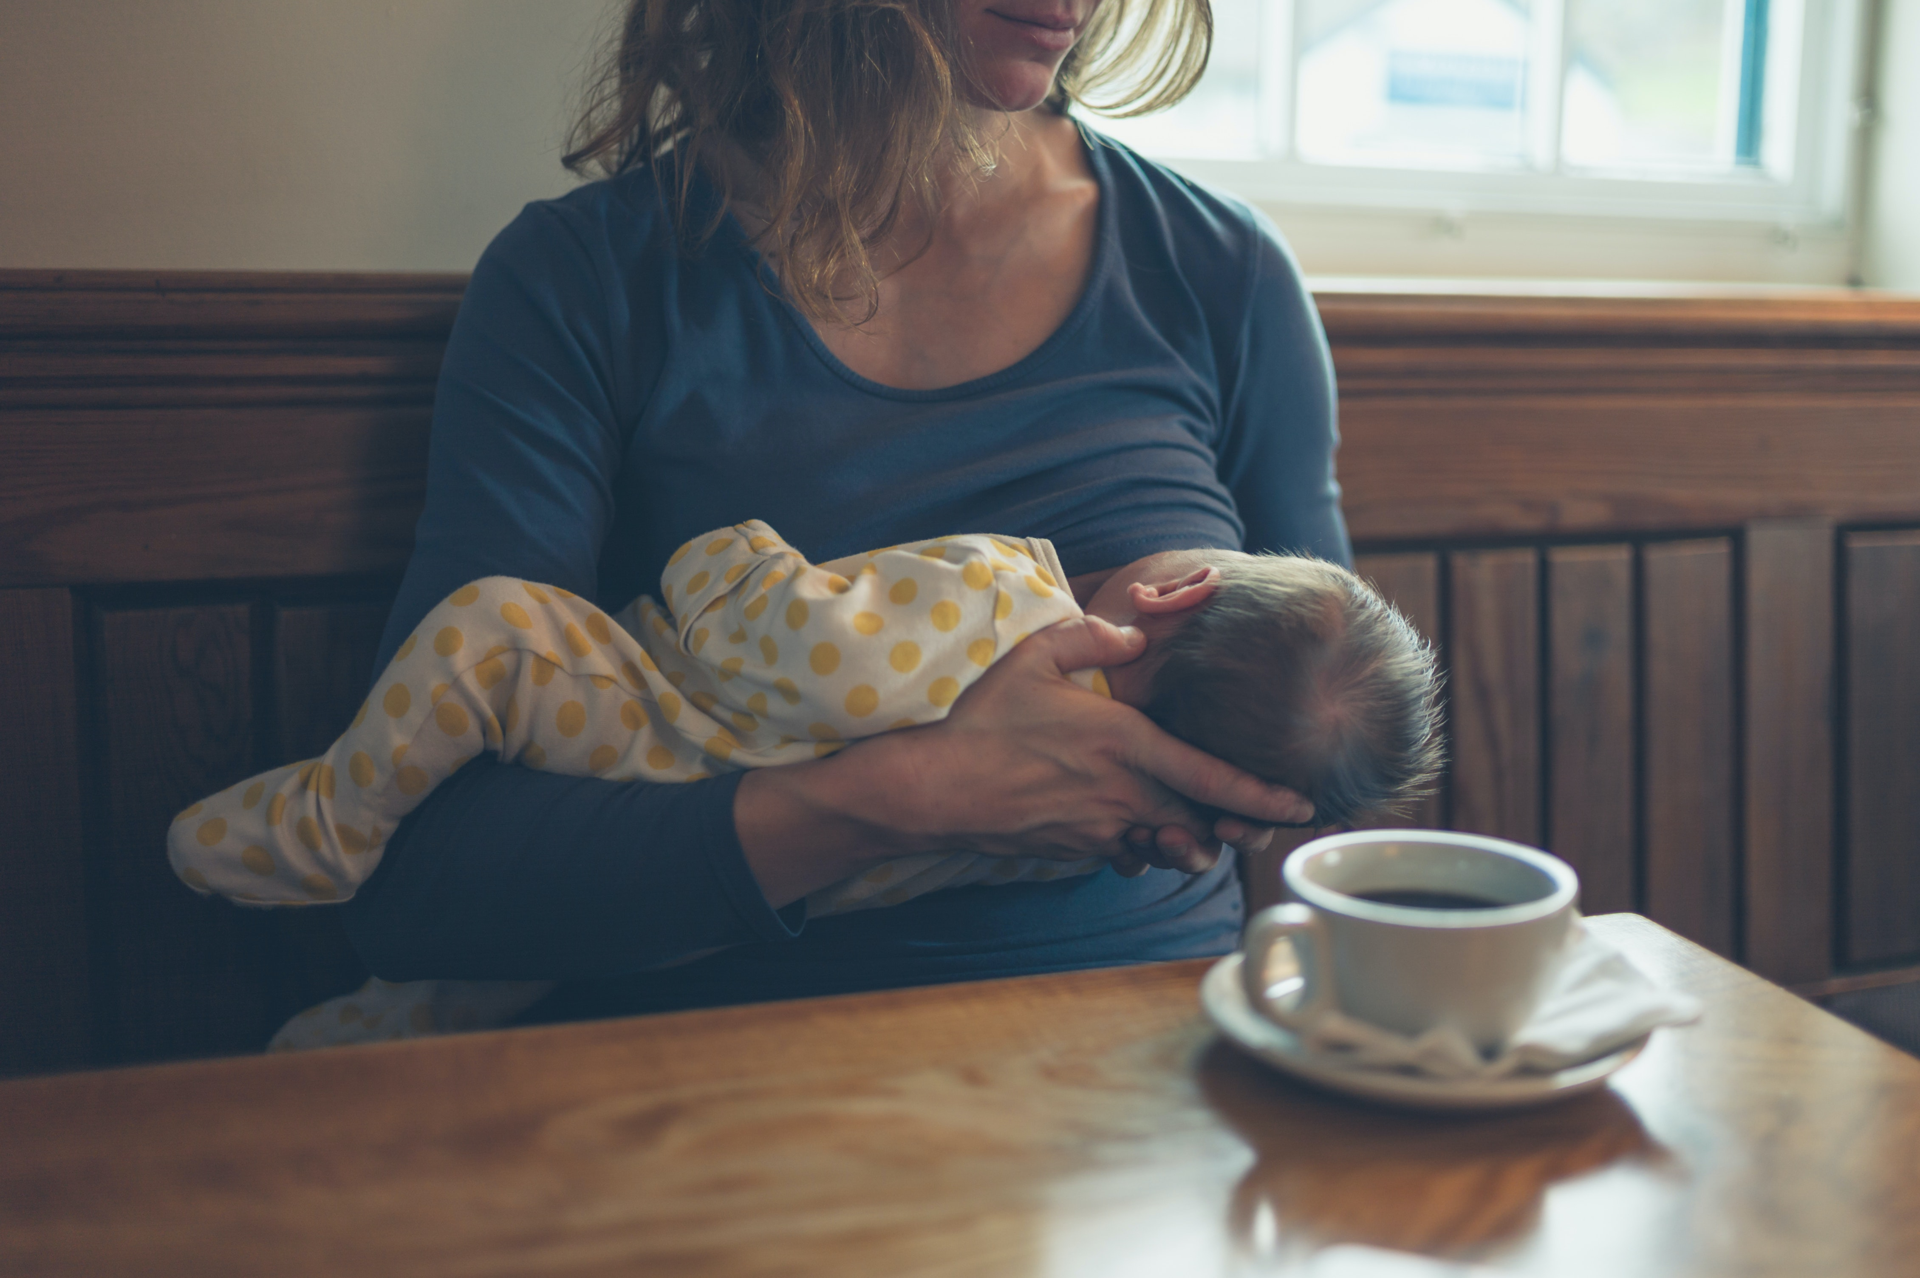 breastfeeding-in-public